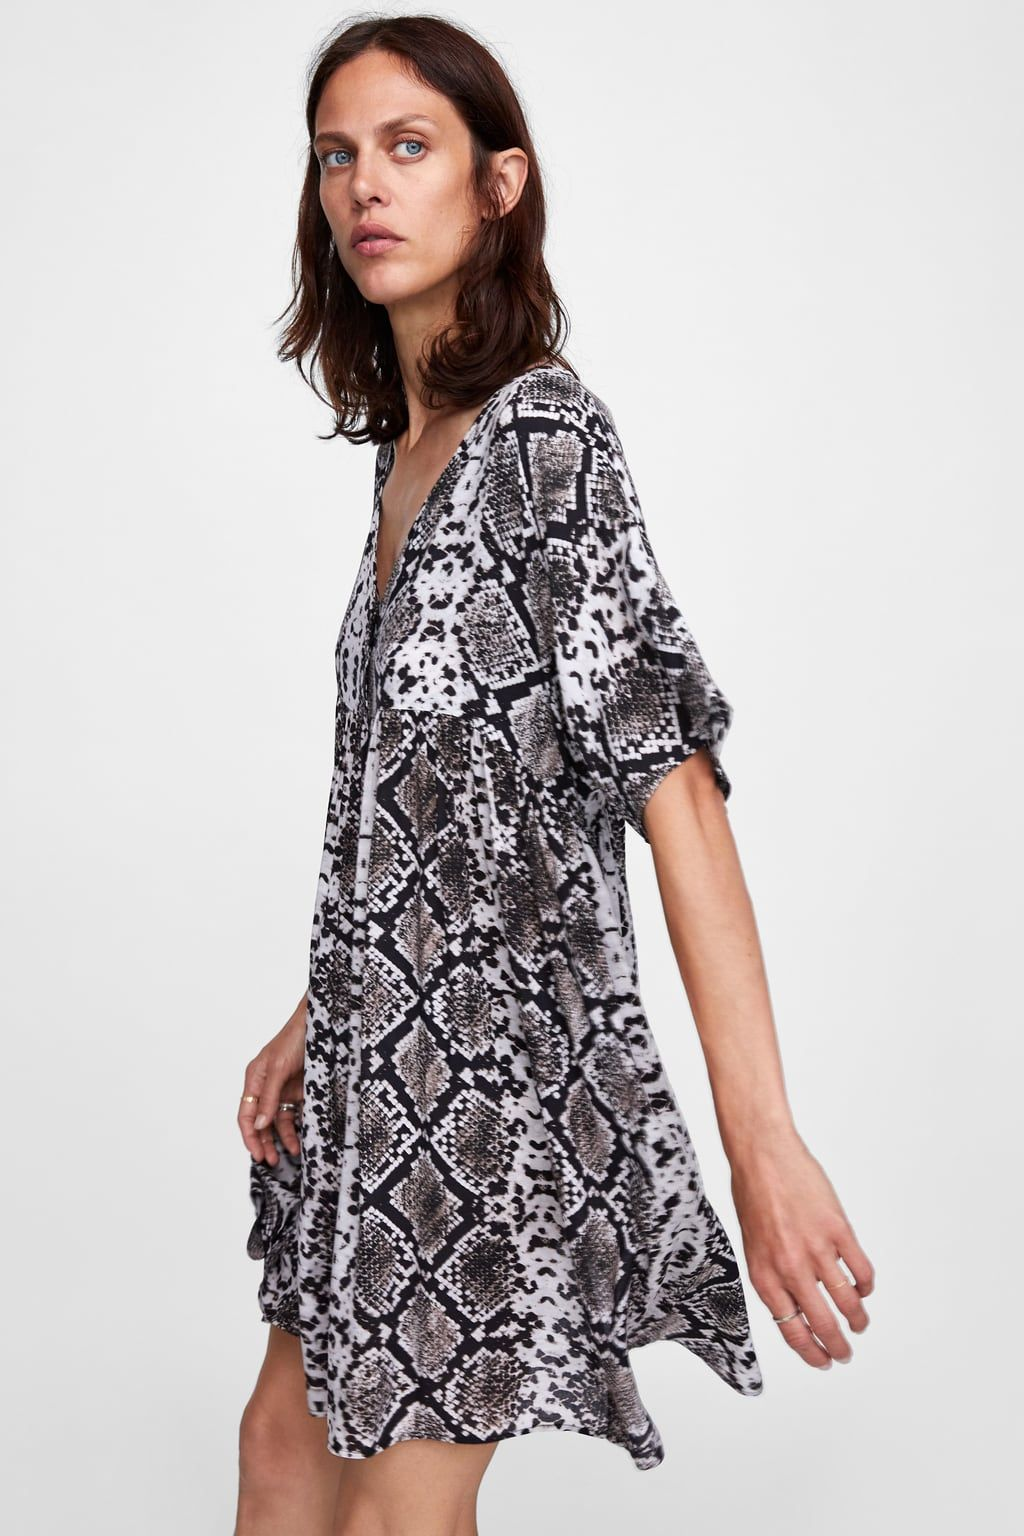 5a12fd9f Image 3 of SNAKESKIN PRINT DRESS from Zara | .o0×X×0o. $ţ¥ℓ€ .o0×X ...